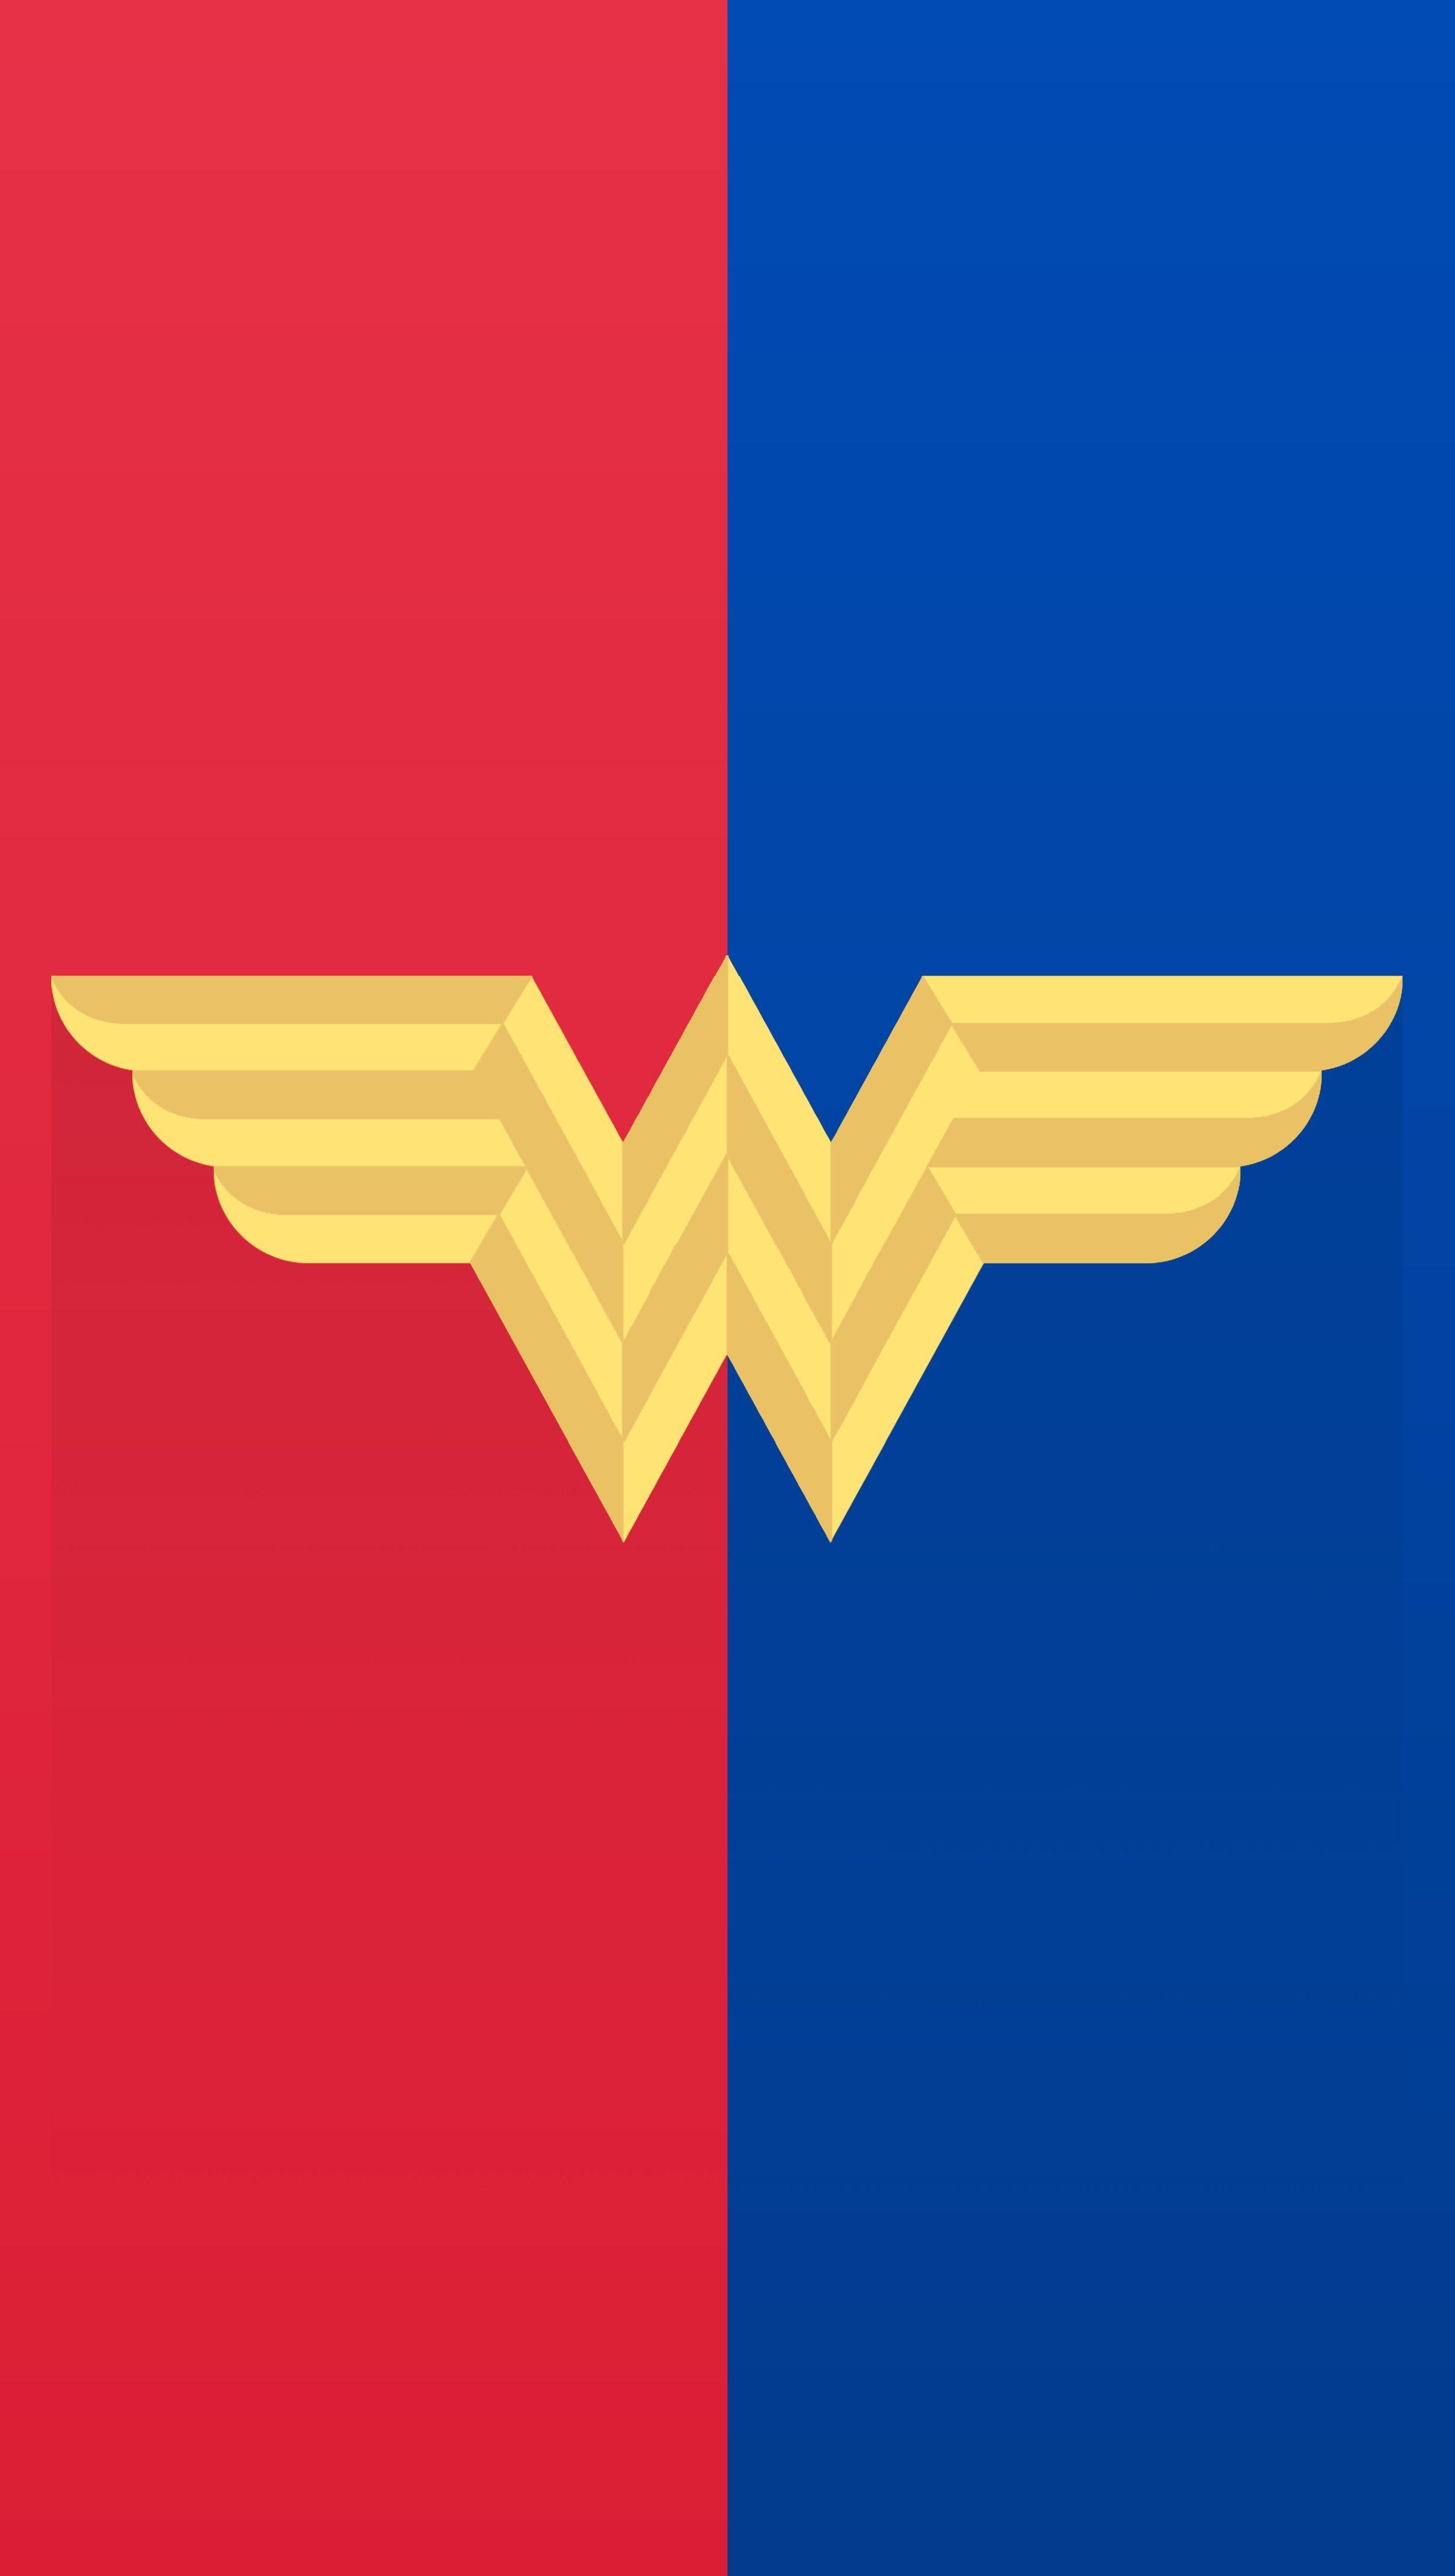 Wallpaper Wonder Woman Logo Minimalist Vertical